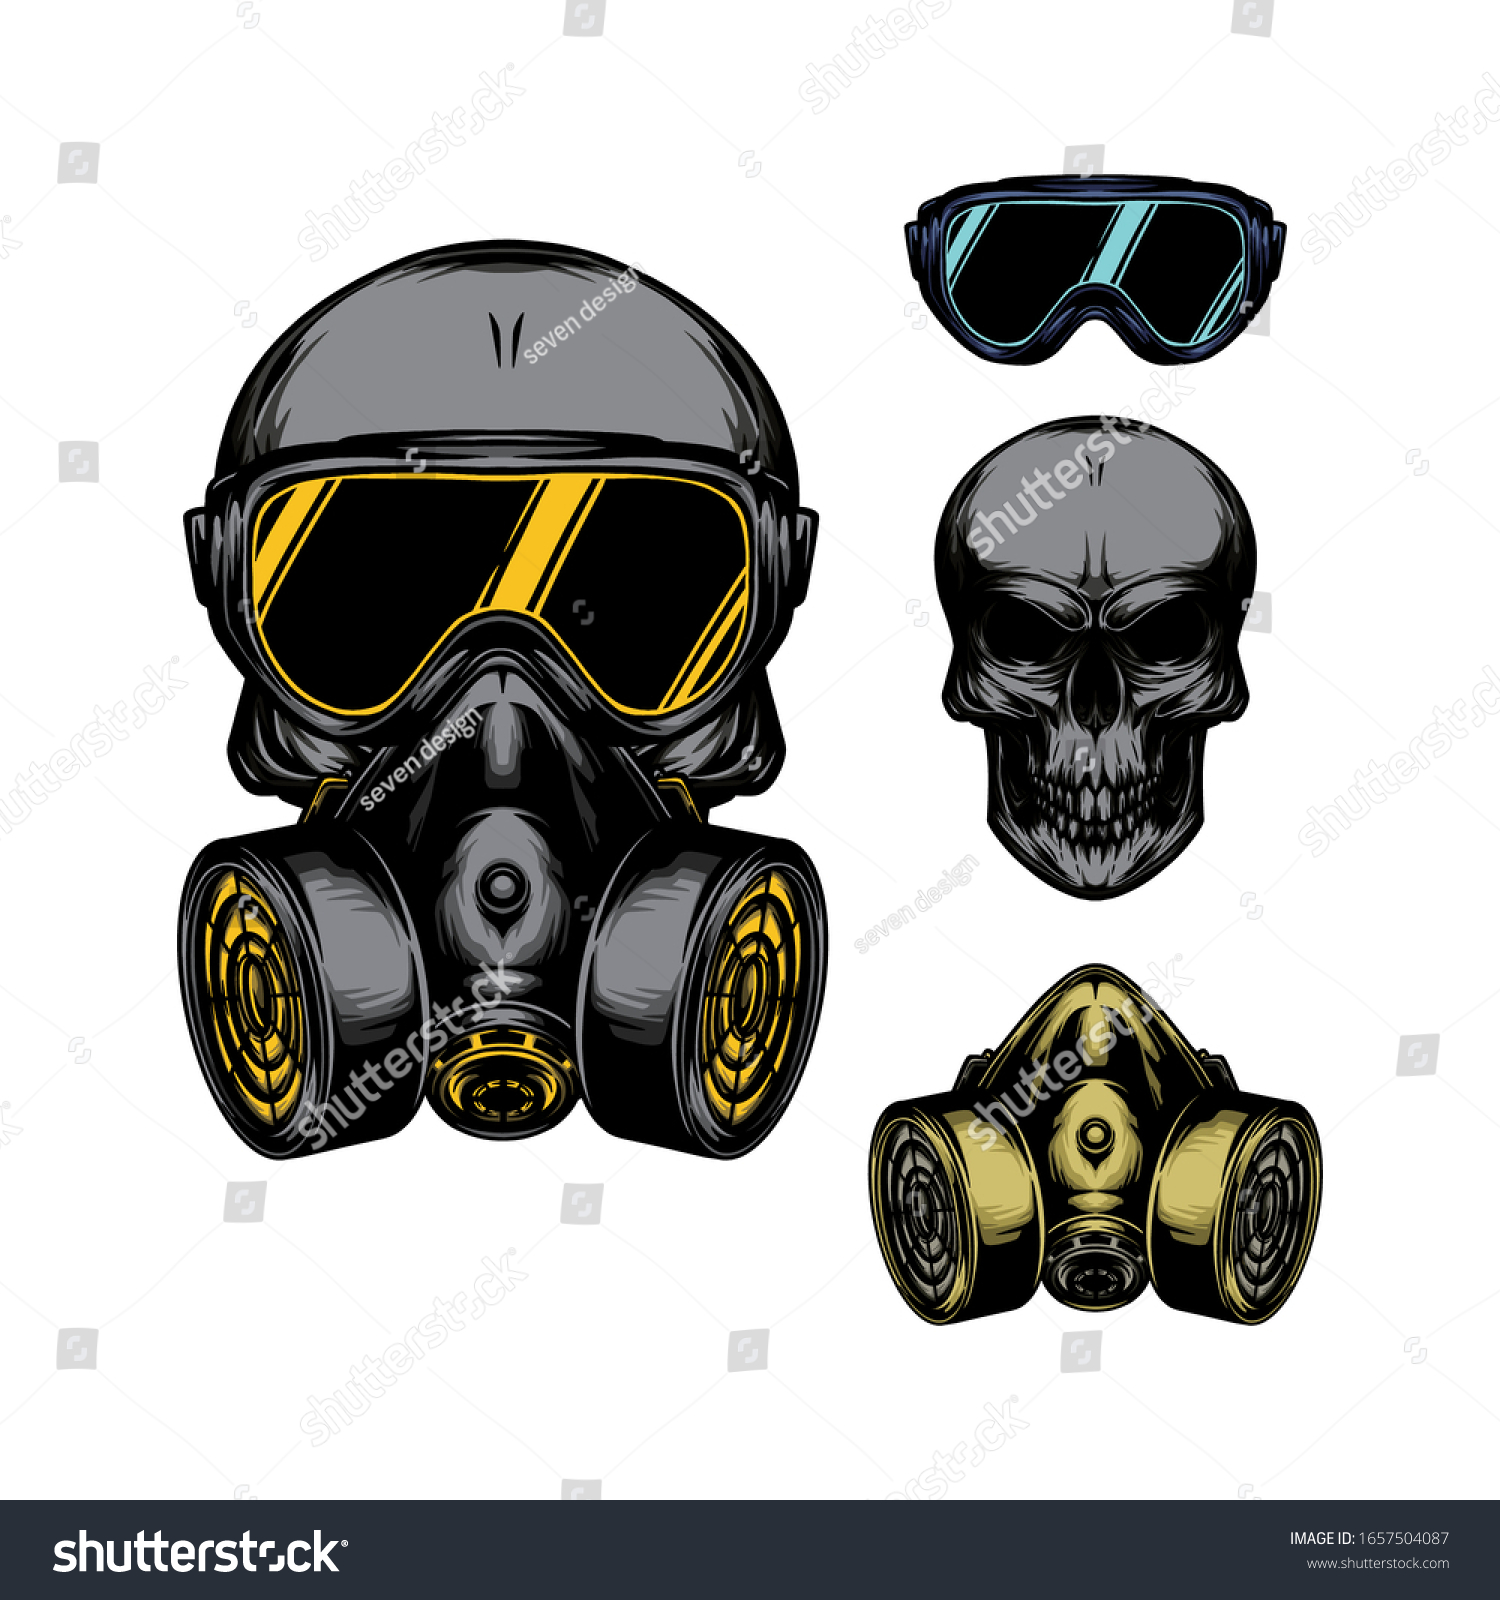 Skull Gas Mask Illustration Toxicity Emblem Stock Vector Royalty Free 1657504087